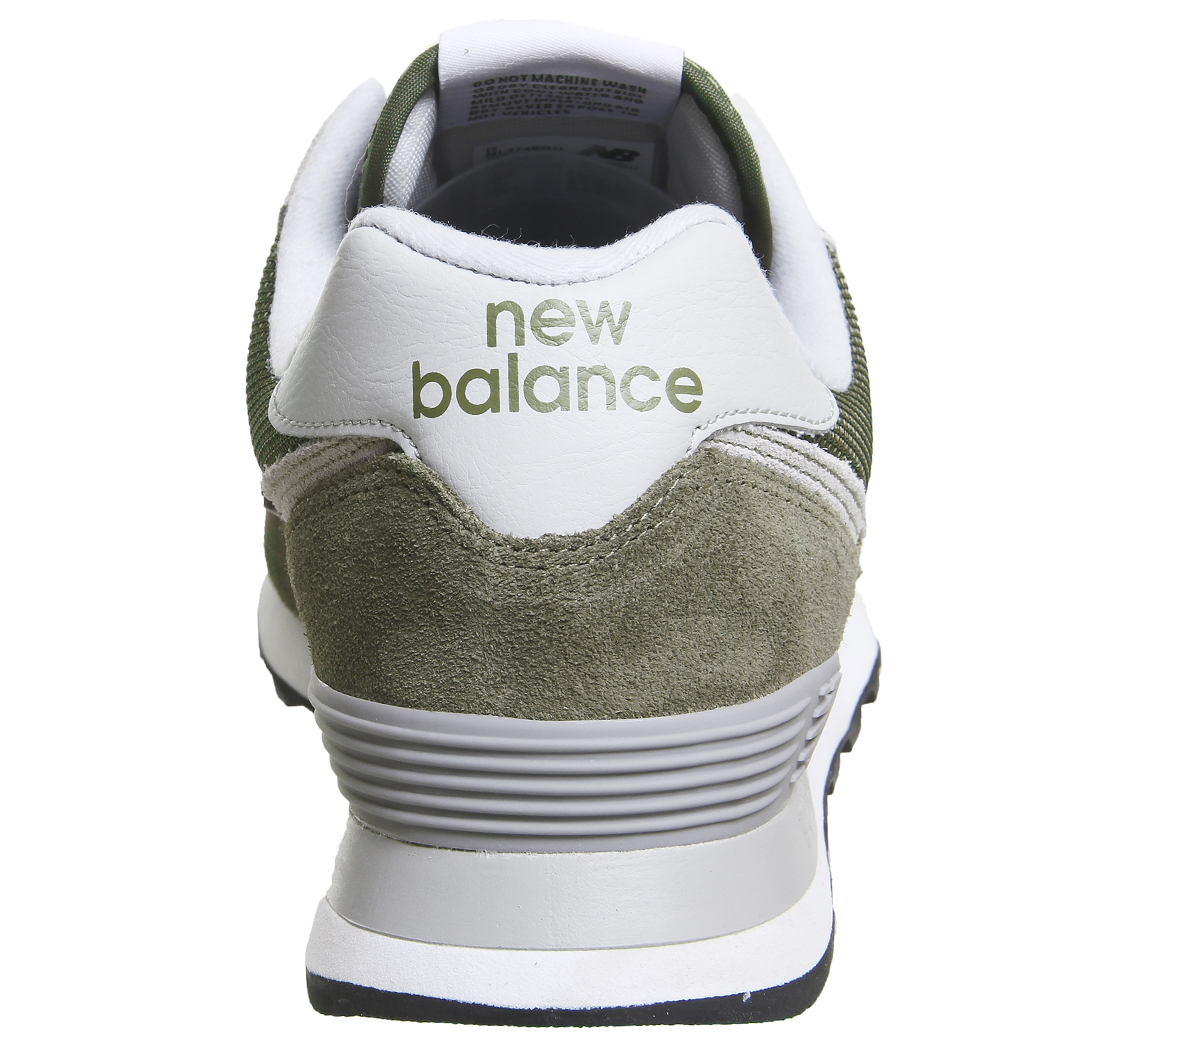 780223731 574-Tenis-Caqui-Tenis-New-Balance-Zapatos miniatura 4